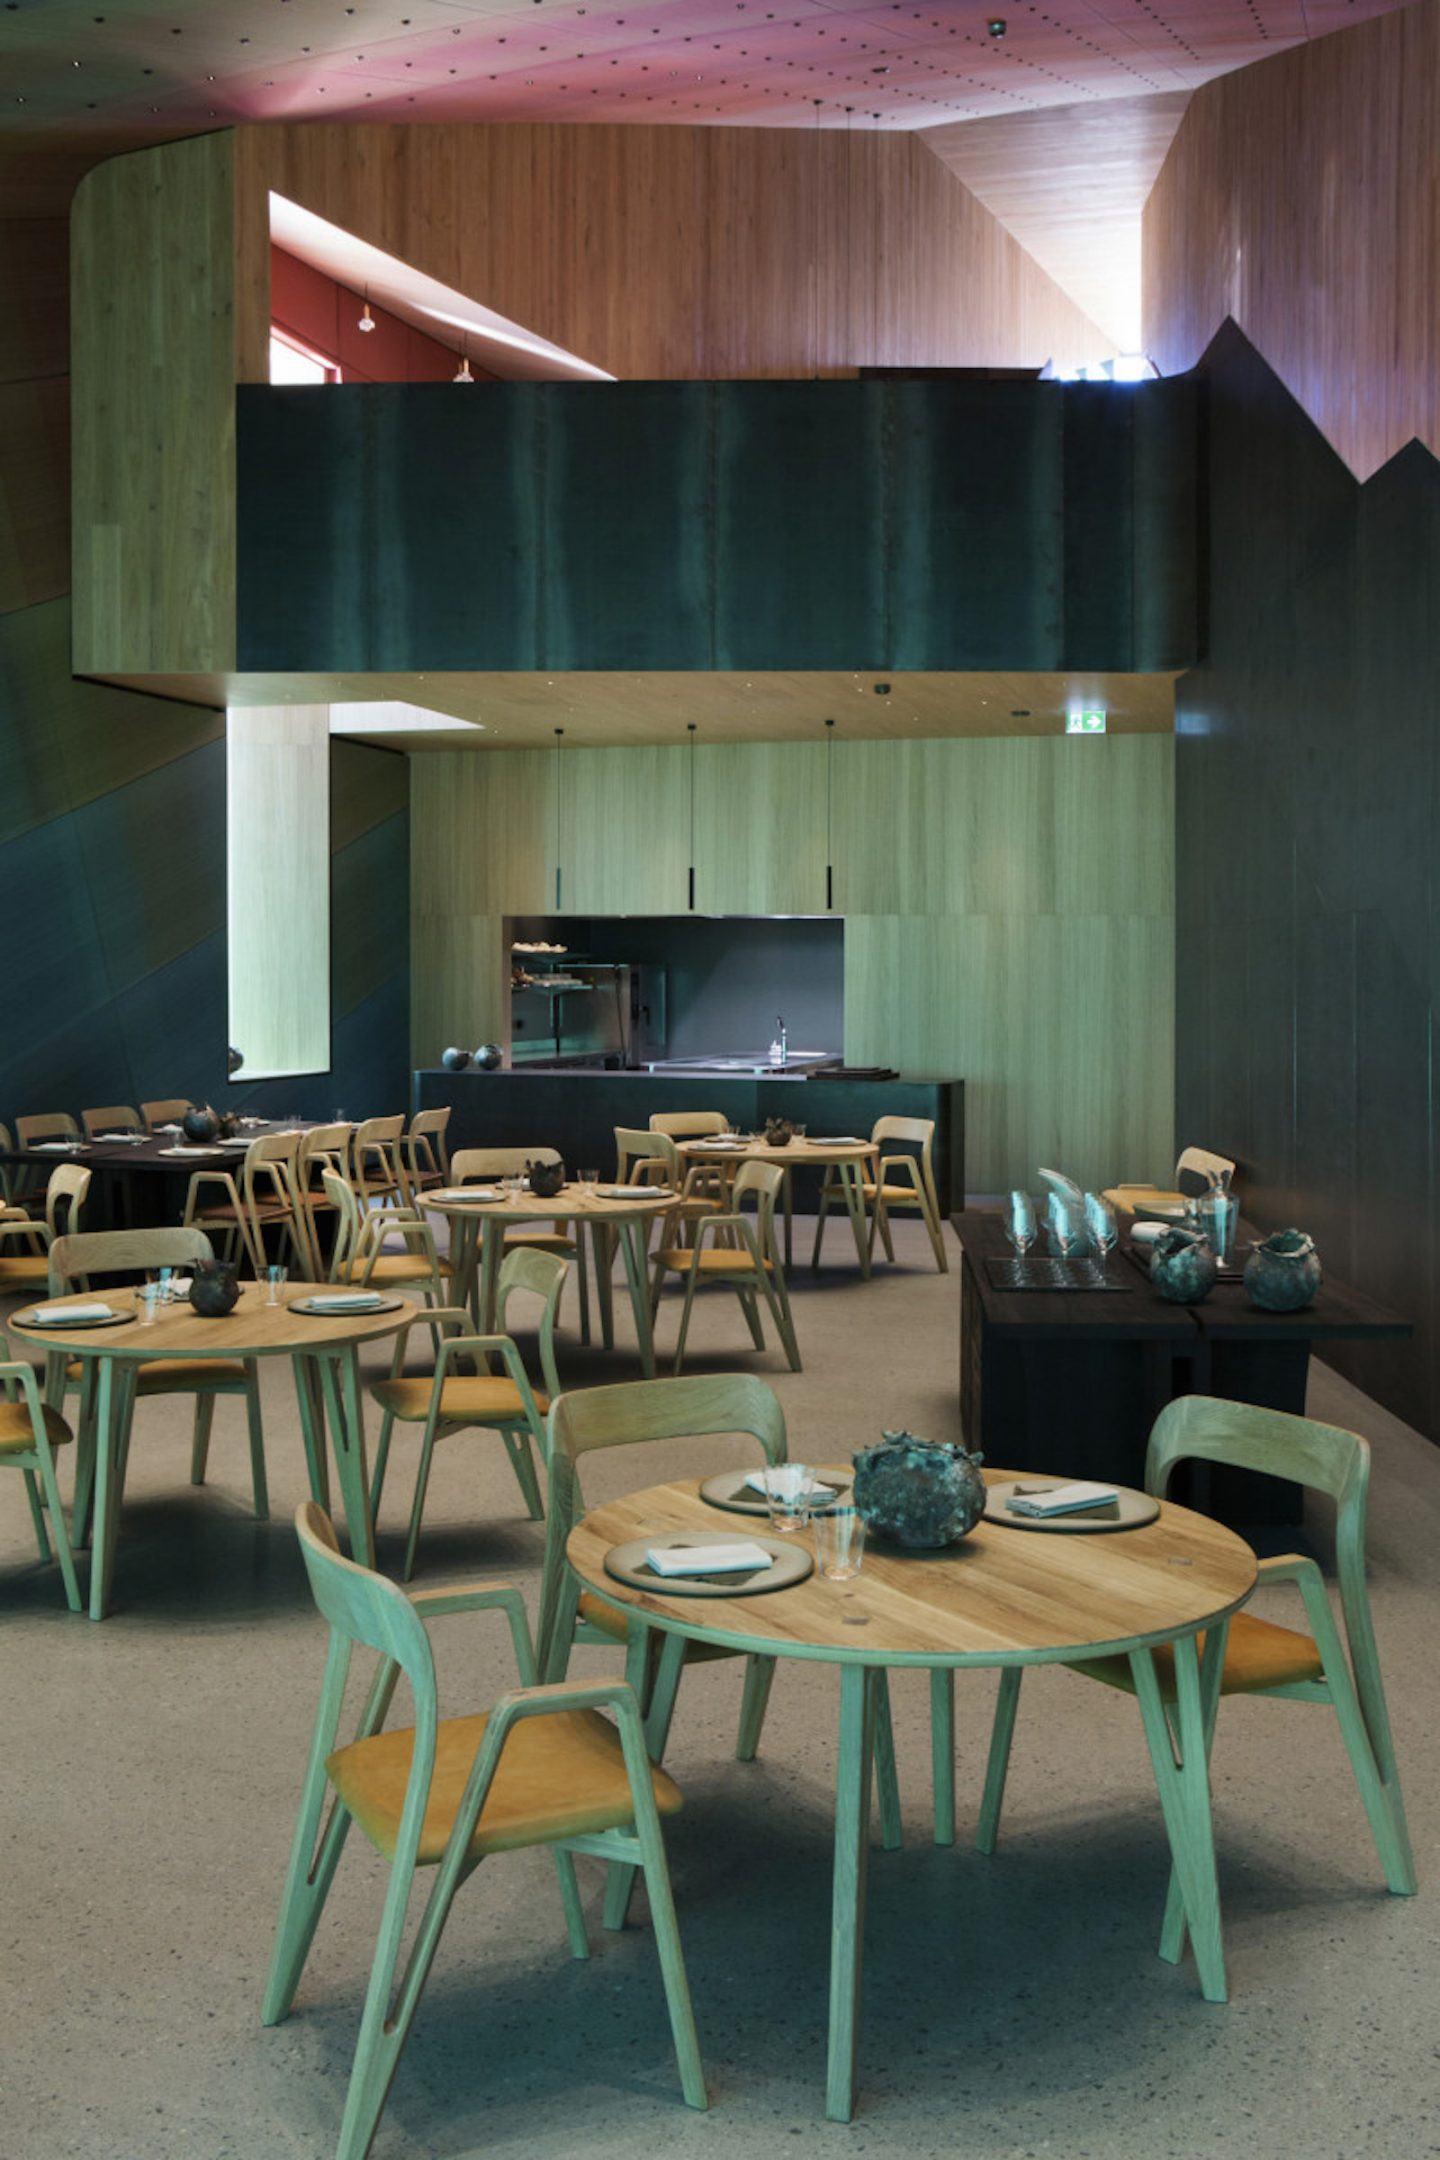 IGNANT-Architecture-Snohetta-Under-Restaurant-010